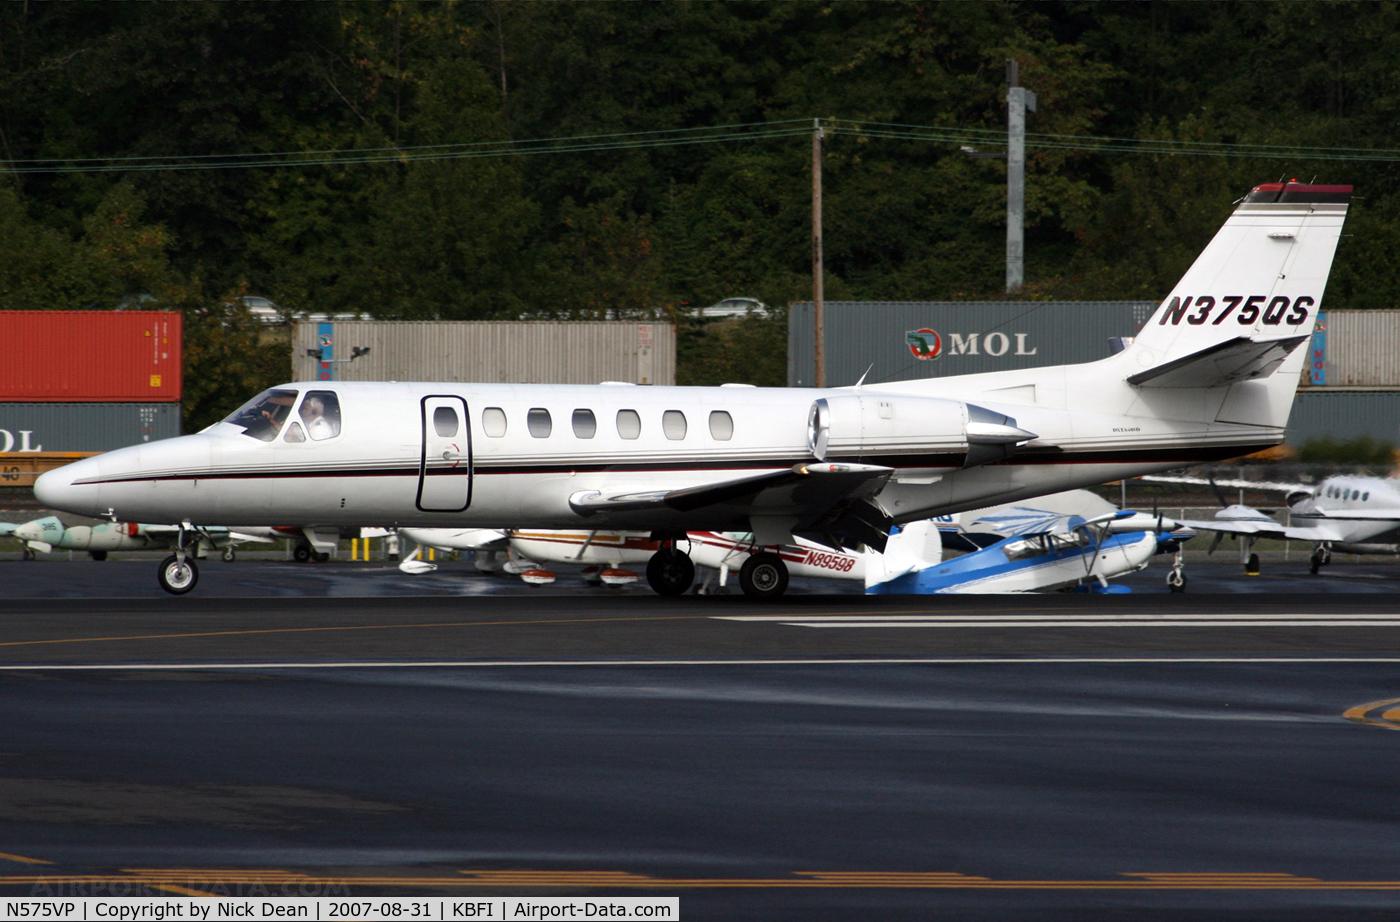 N575VP, 1996 Cessna 560 C/N 560-0375, KBFI (Seen here as N375QS and currently registered N575VP as posted)